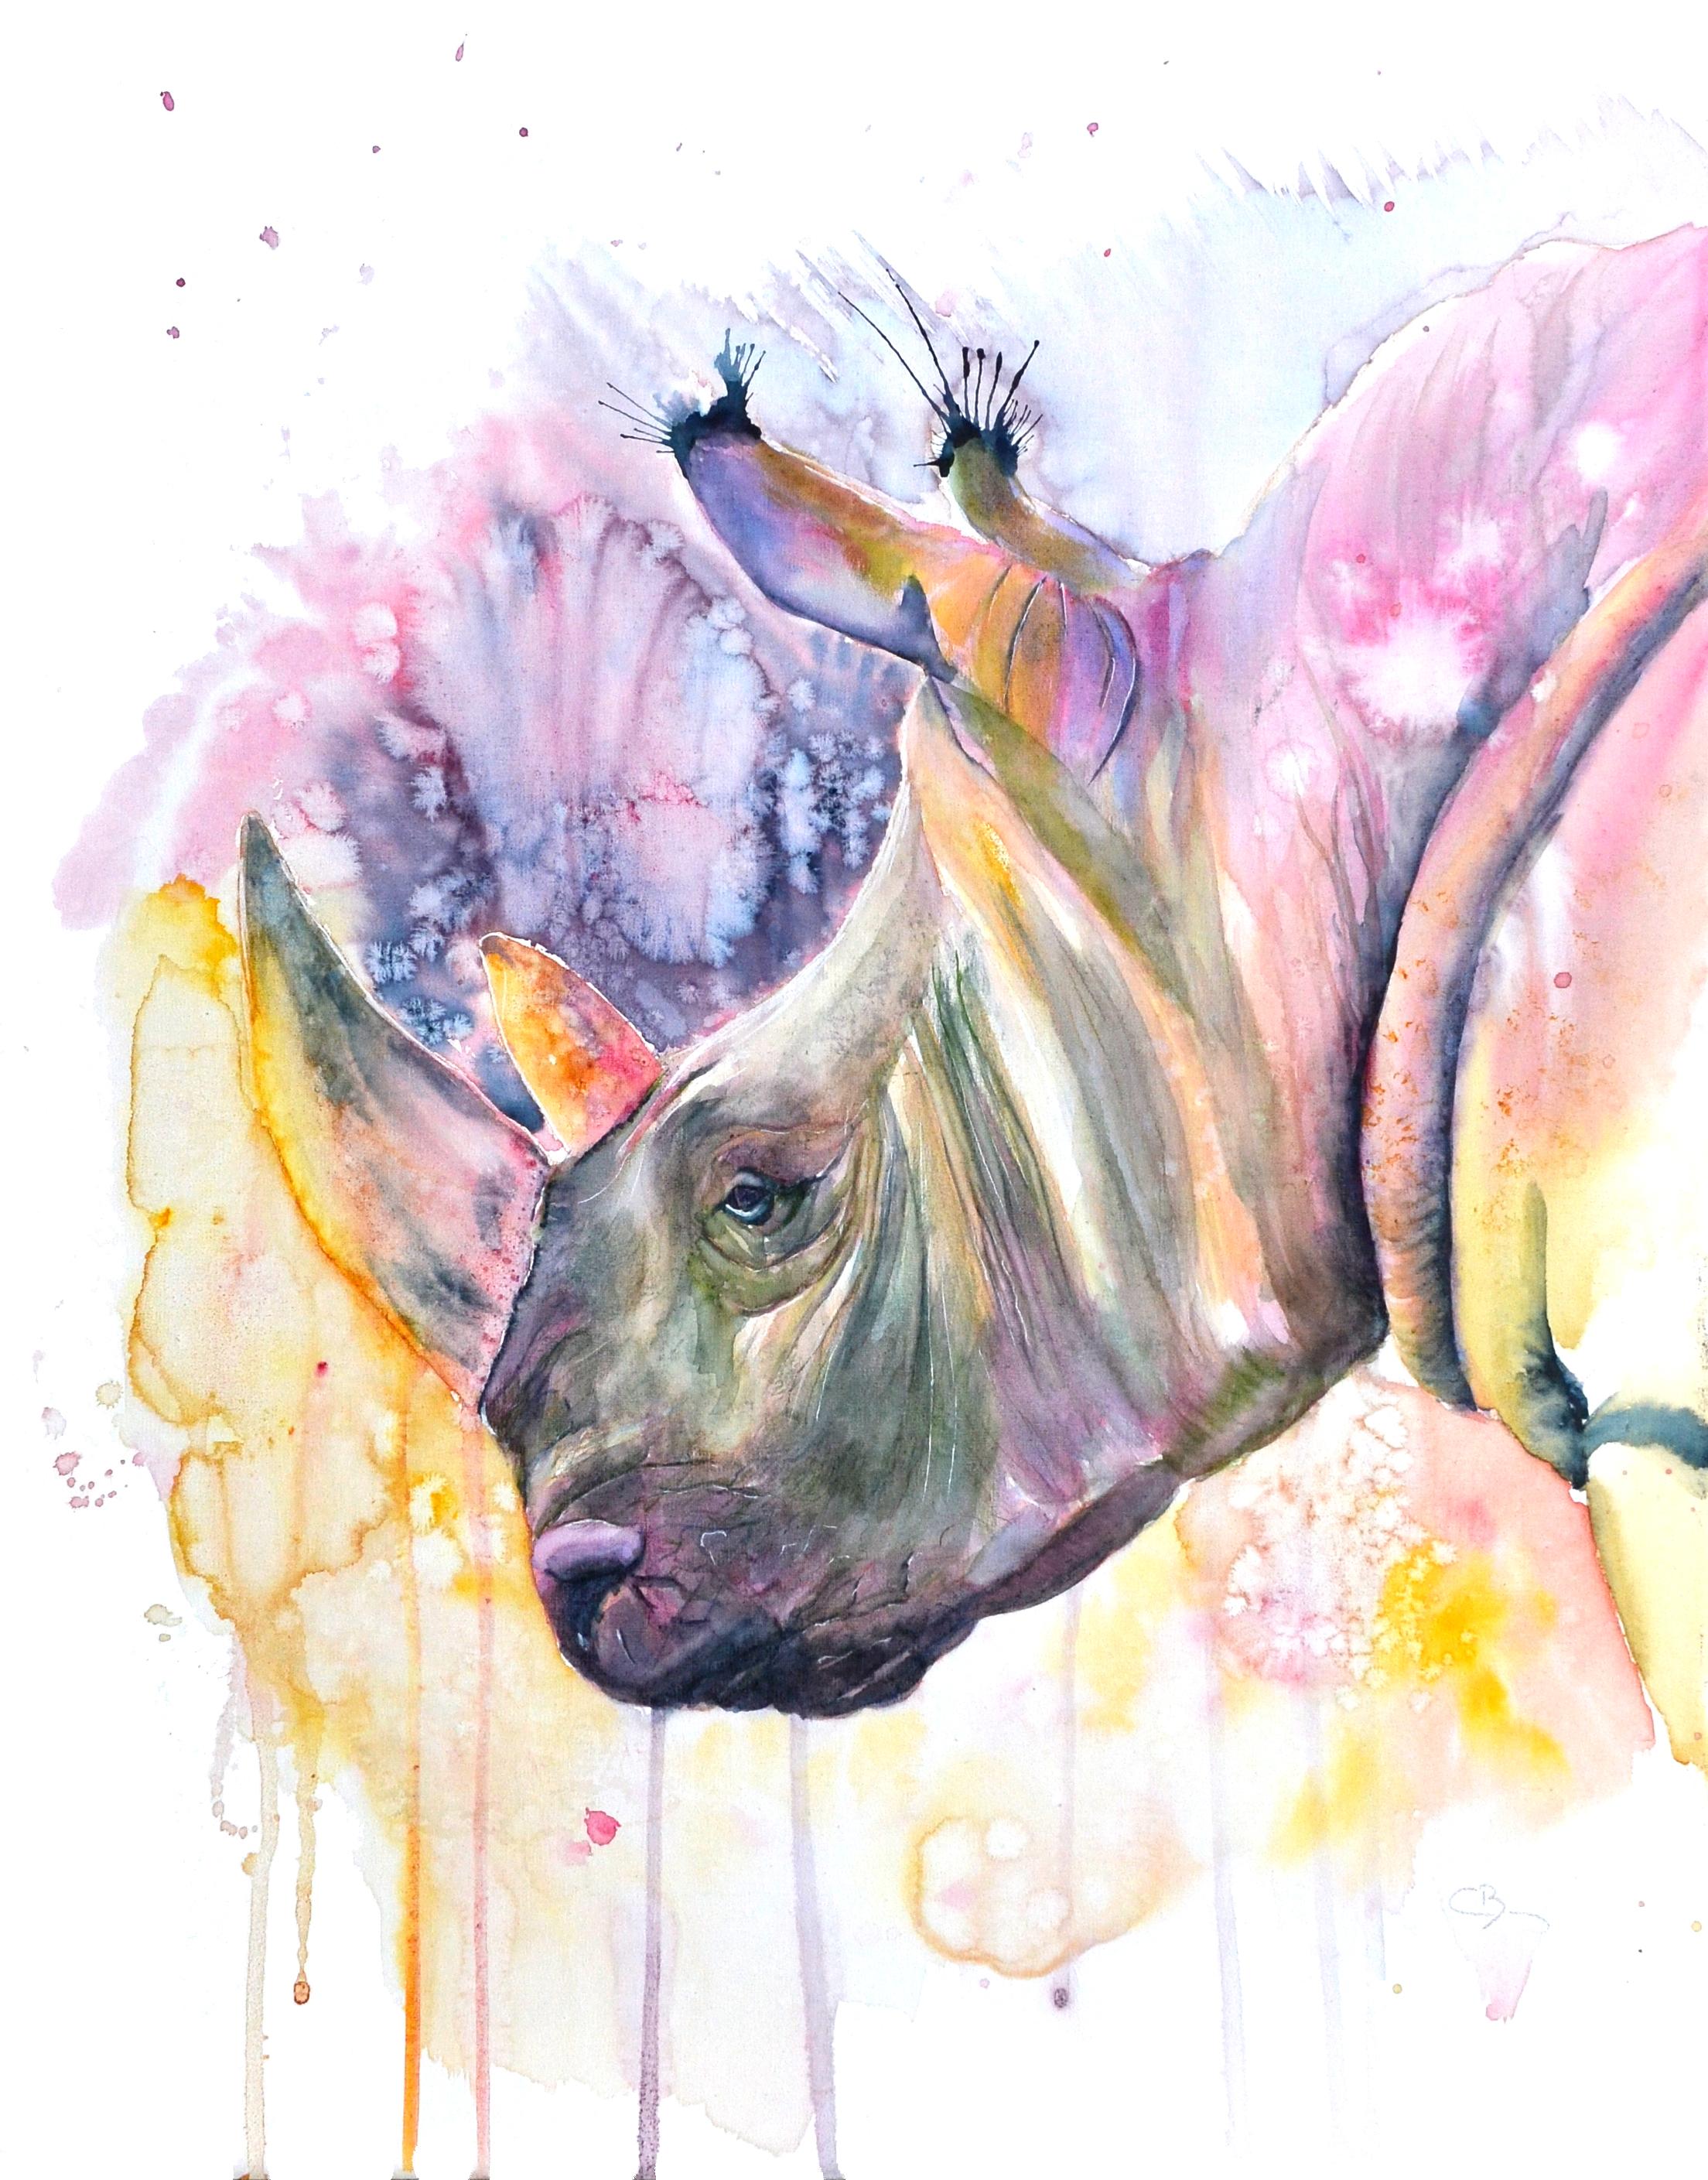 Rhinocéros surréaliste